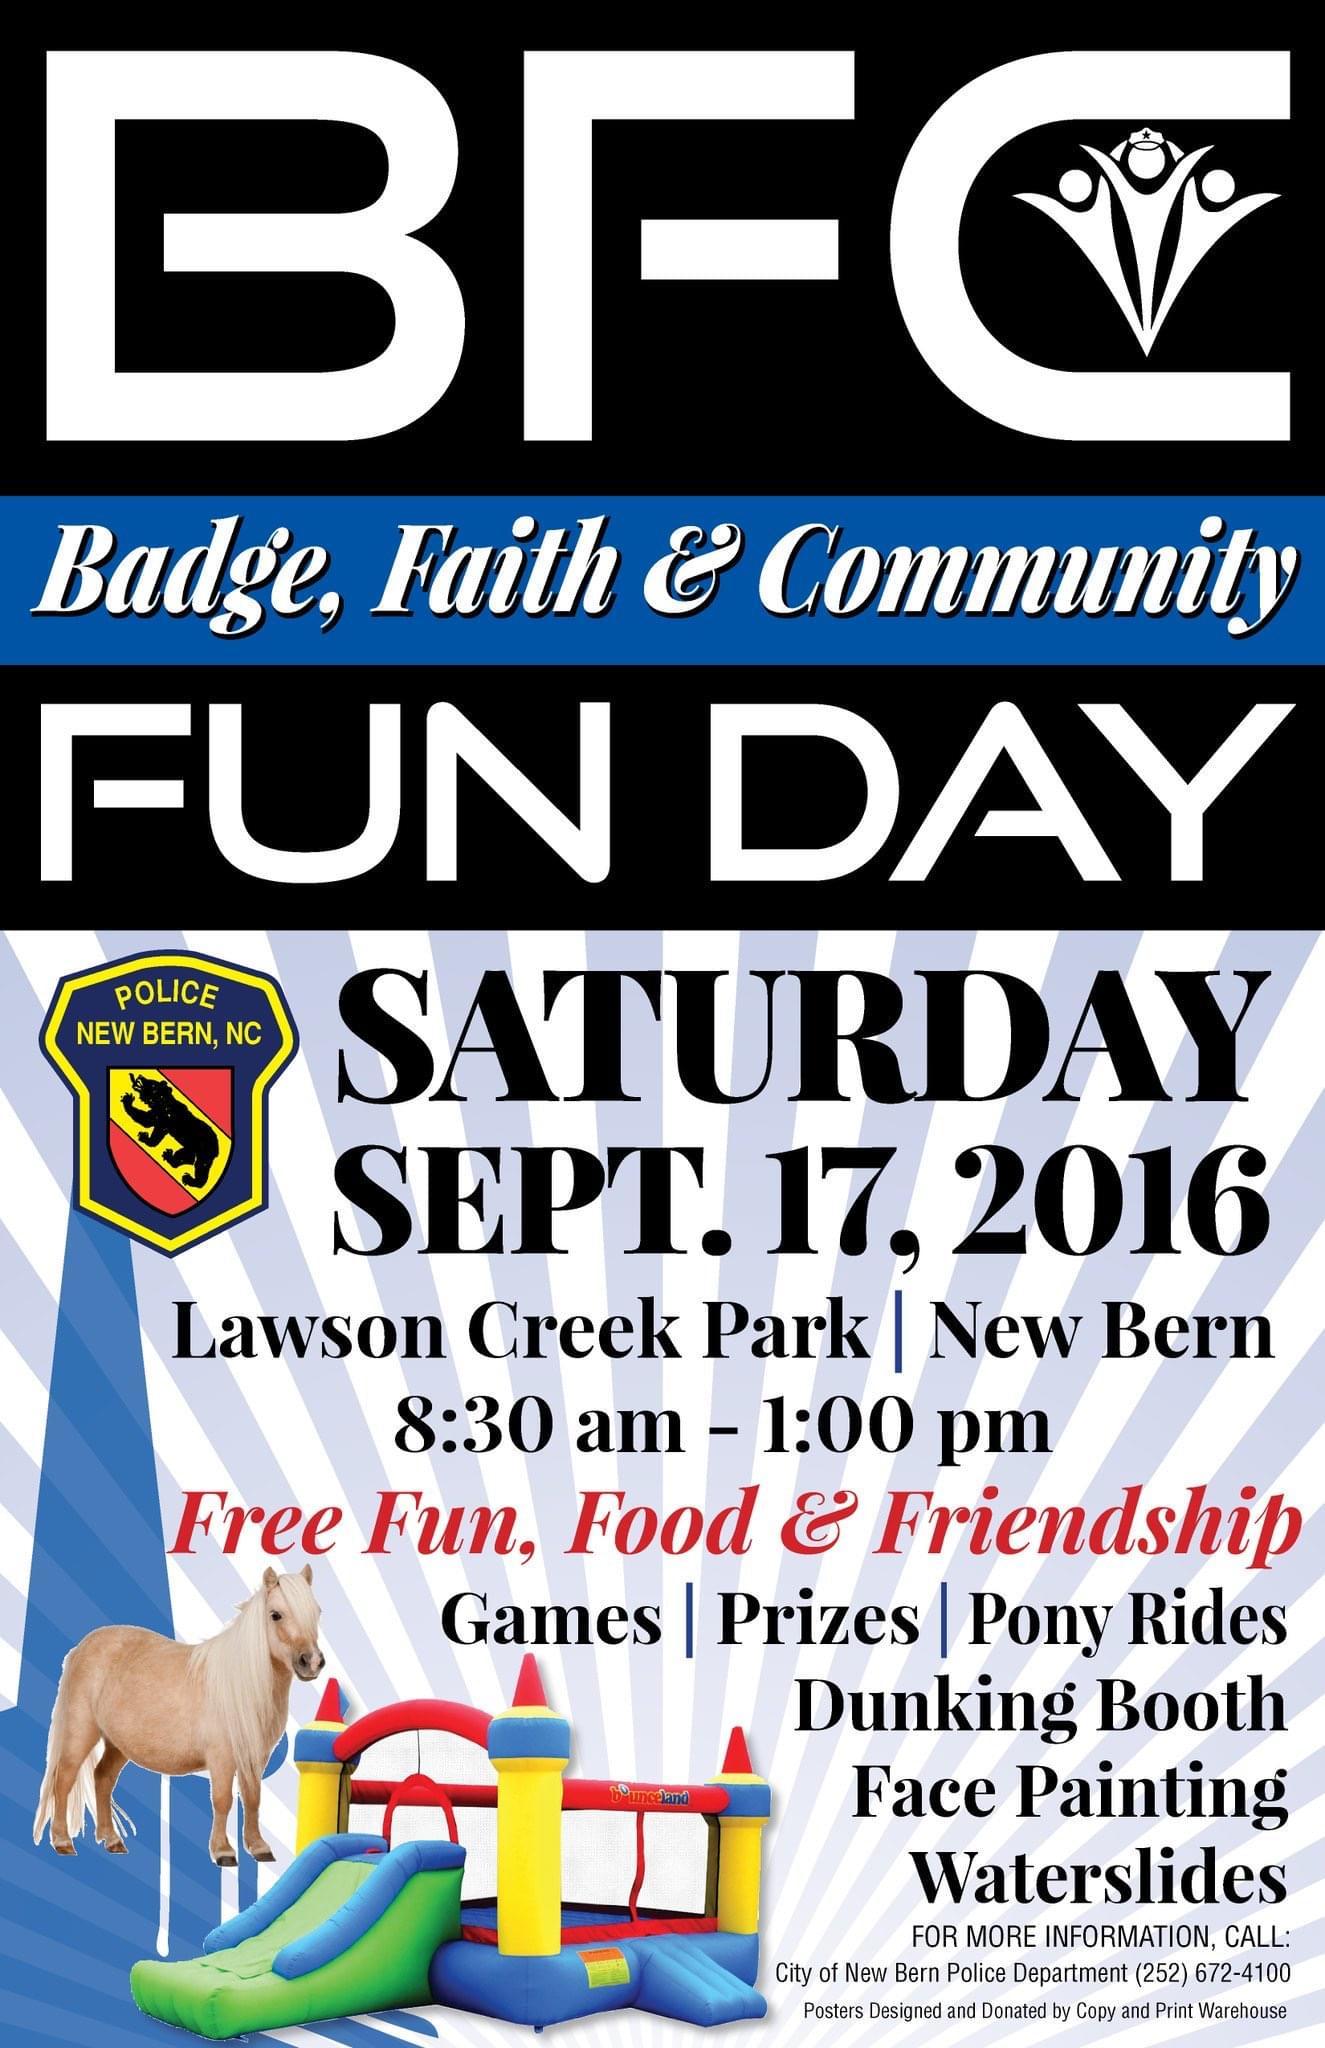 Badge, Faith & Community Fun Day Happening September 15, 2018